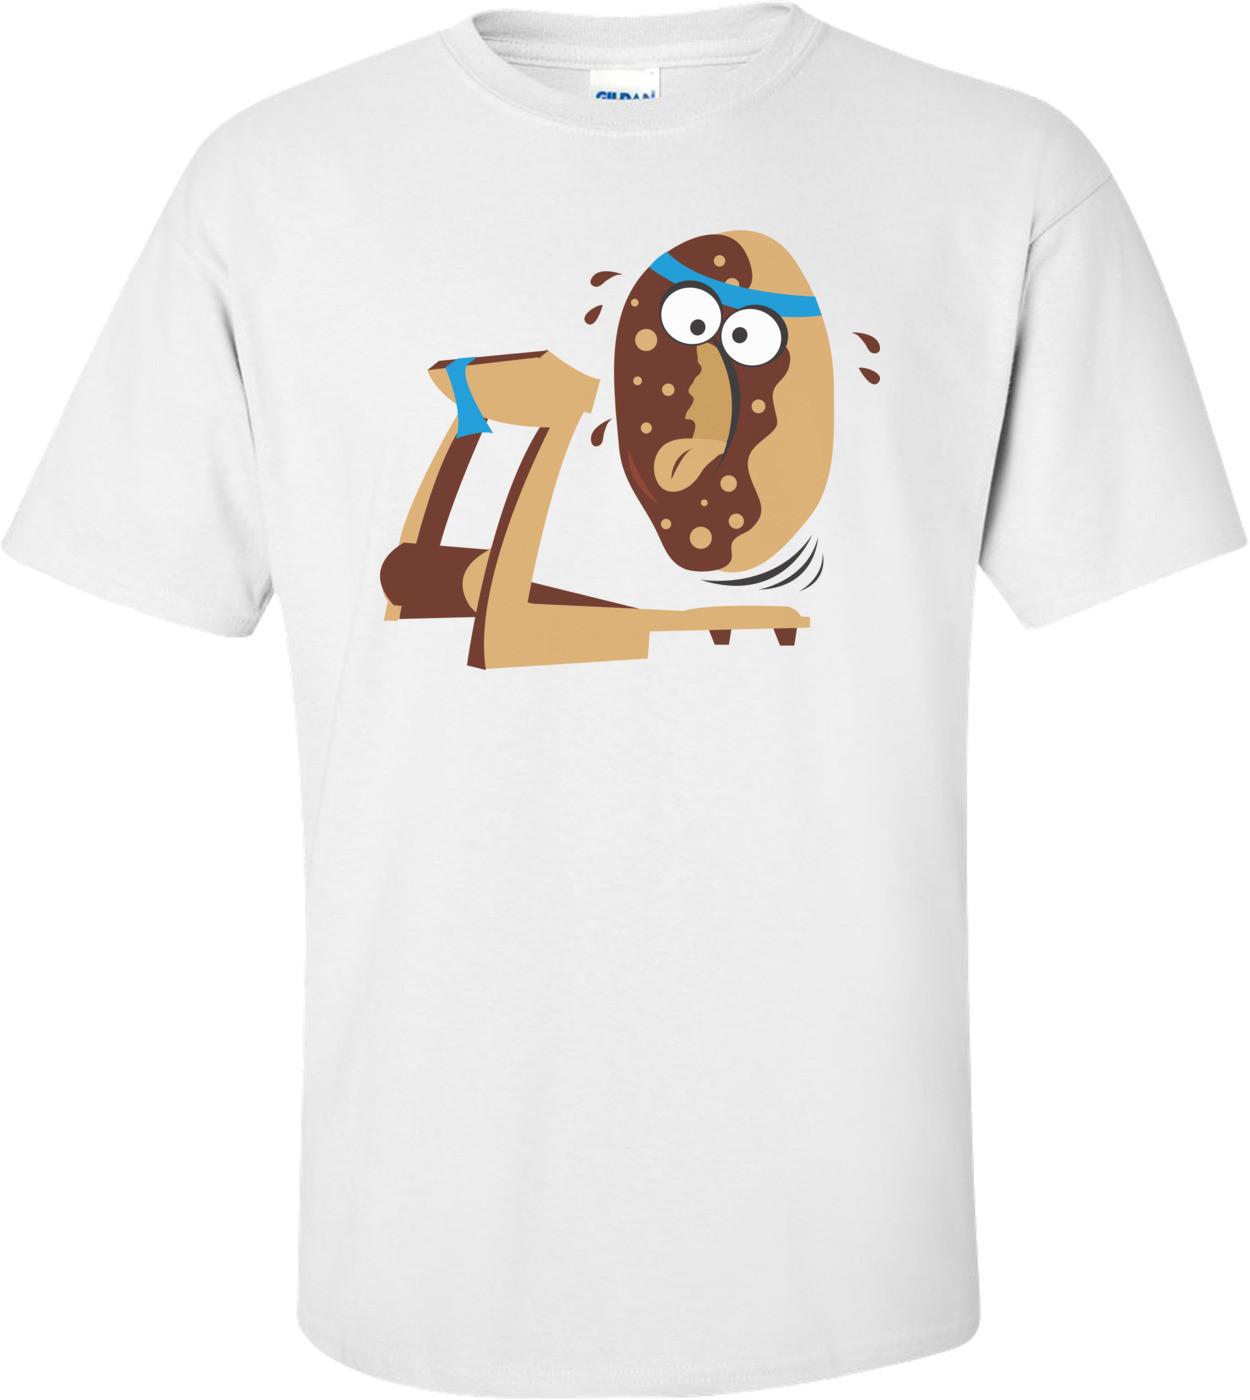 Donut On Treadmill Funny Shirt